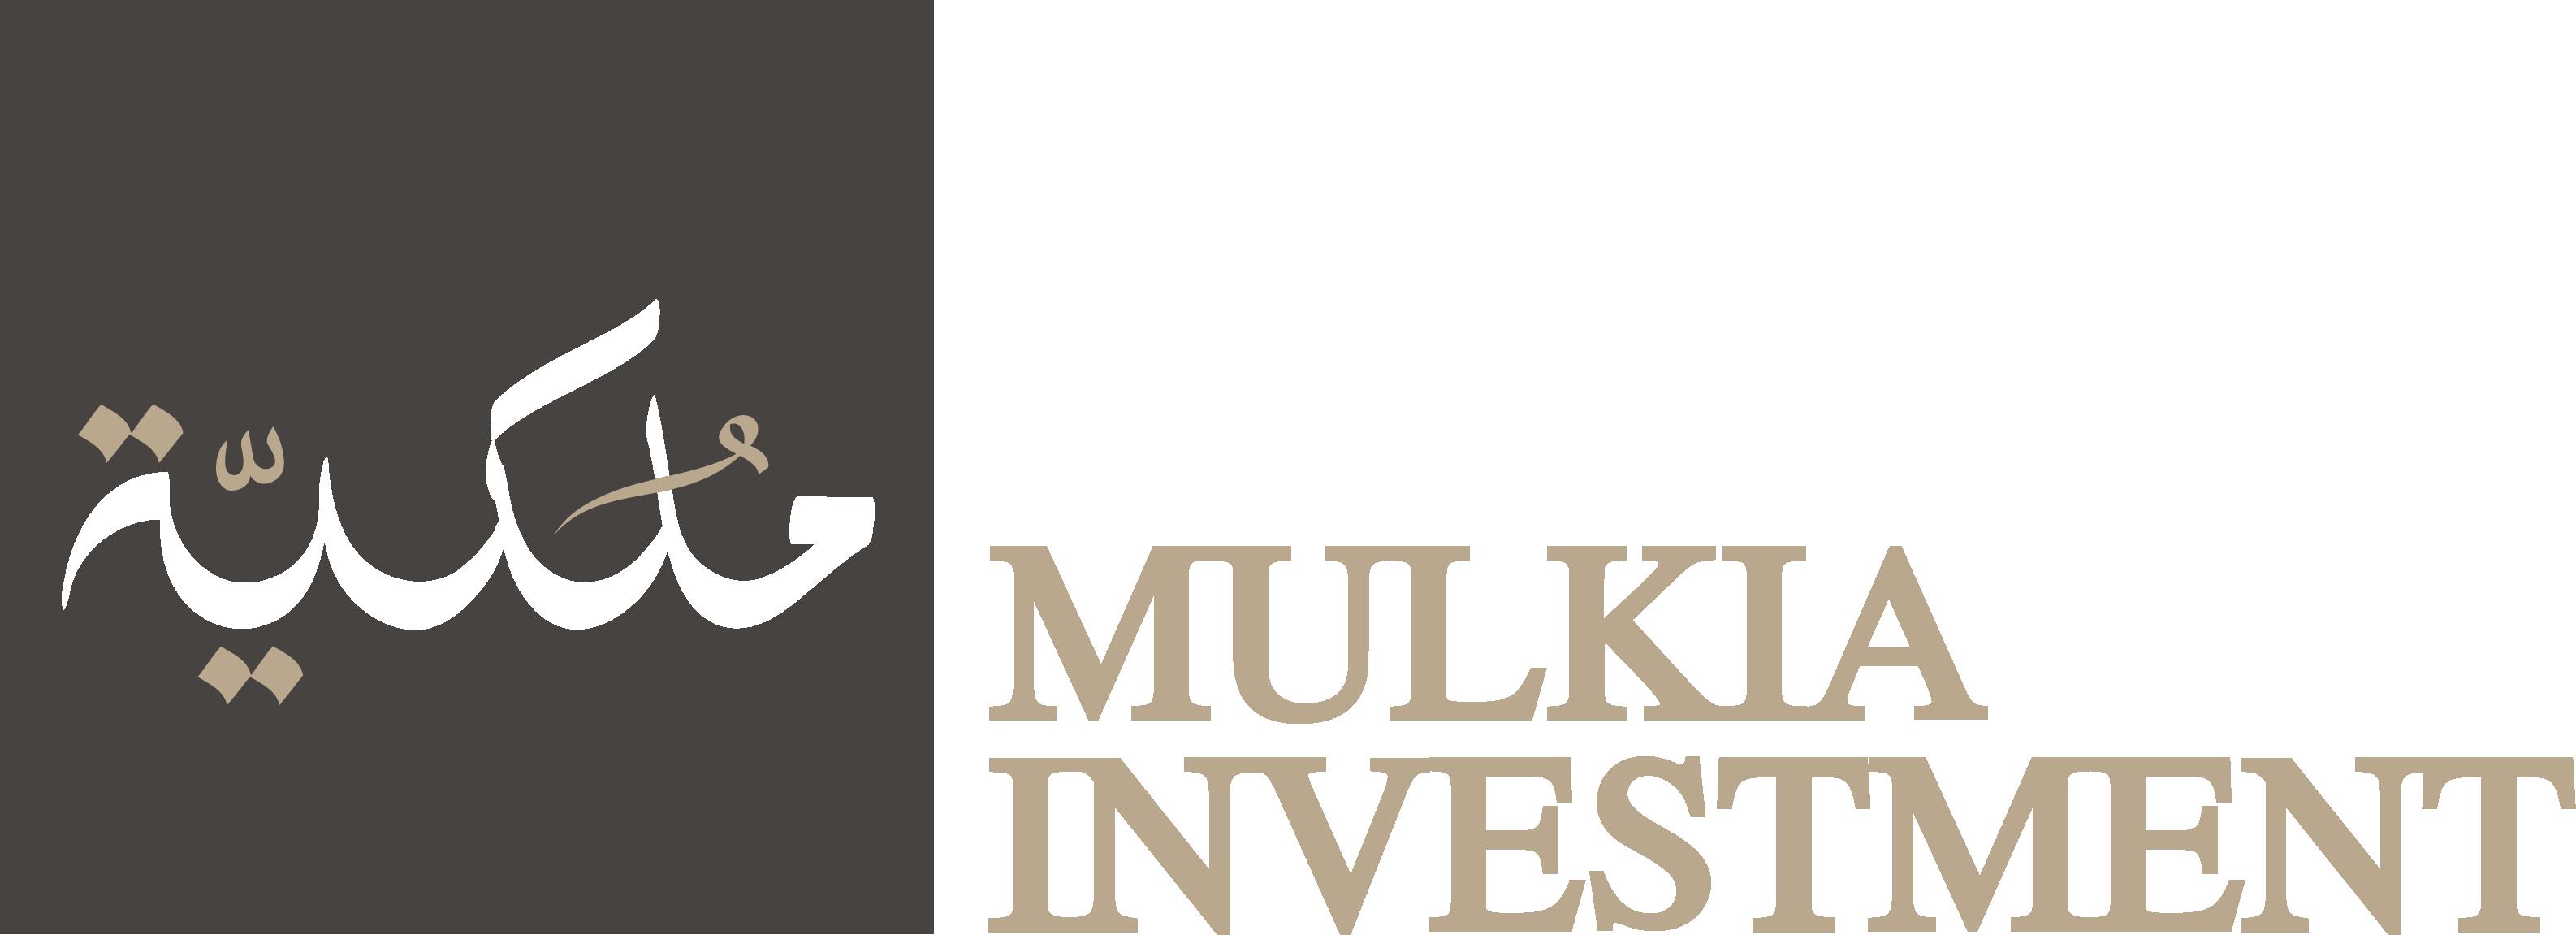 Mulkia